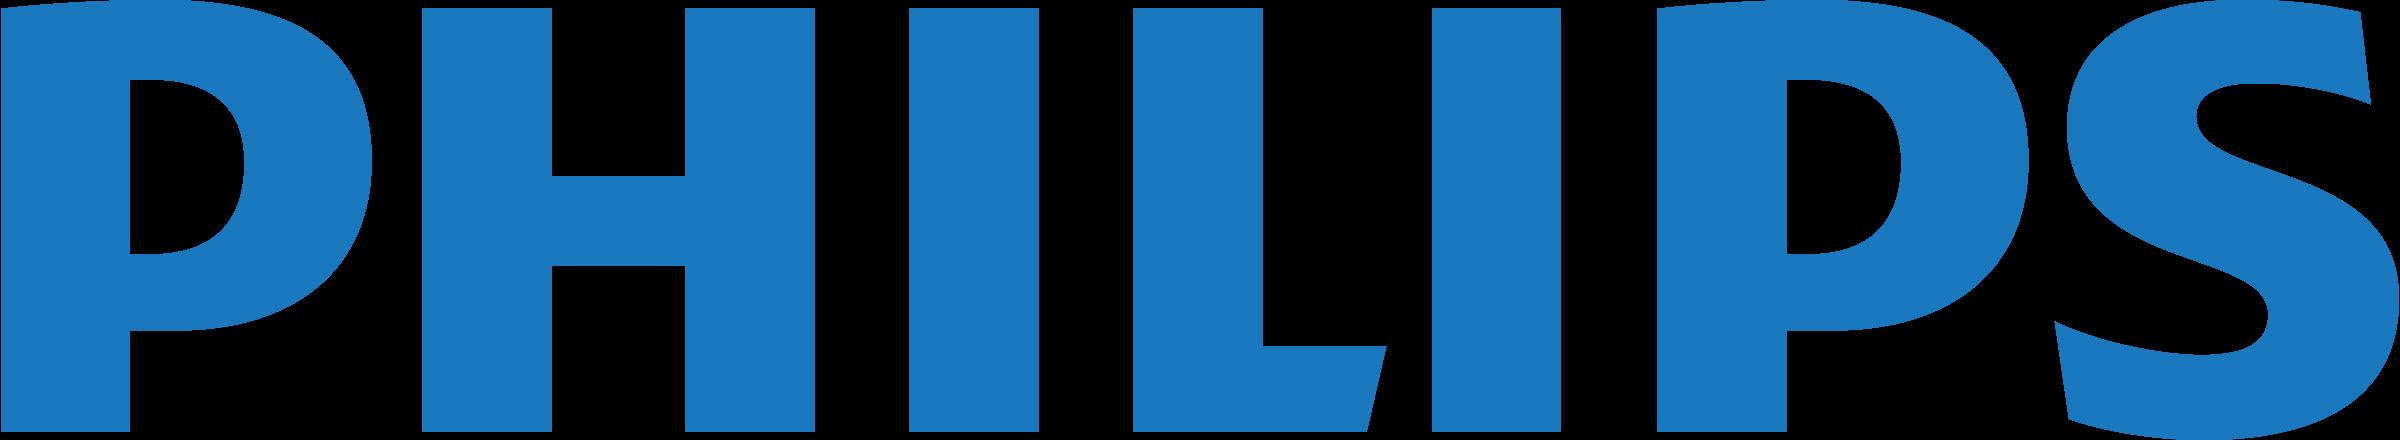 Philips Logo PNG Transparent & SVG Vector - Freebie Supply